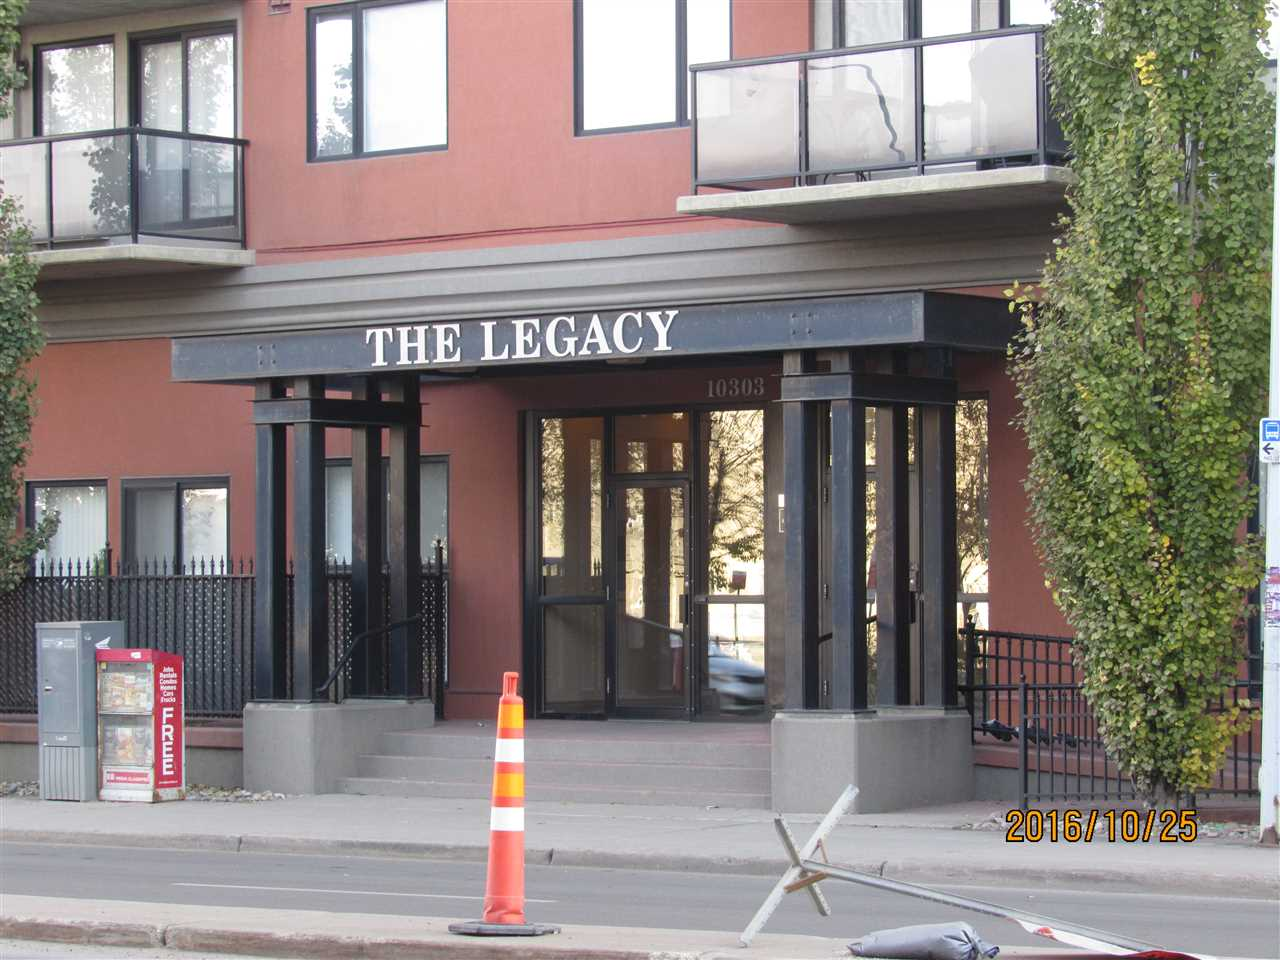 10303 105 Street 305, Edmonton, AB T5J 5G3